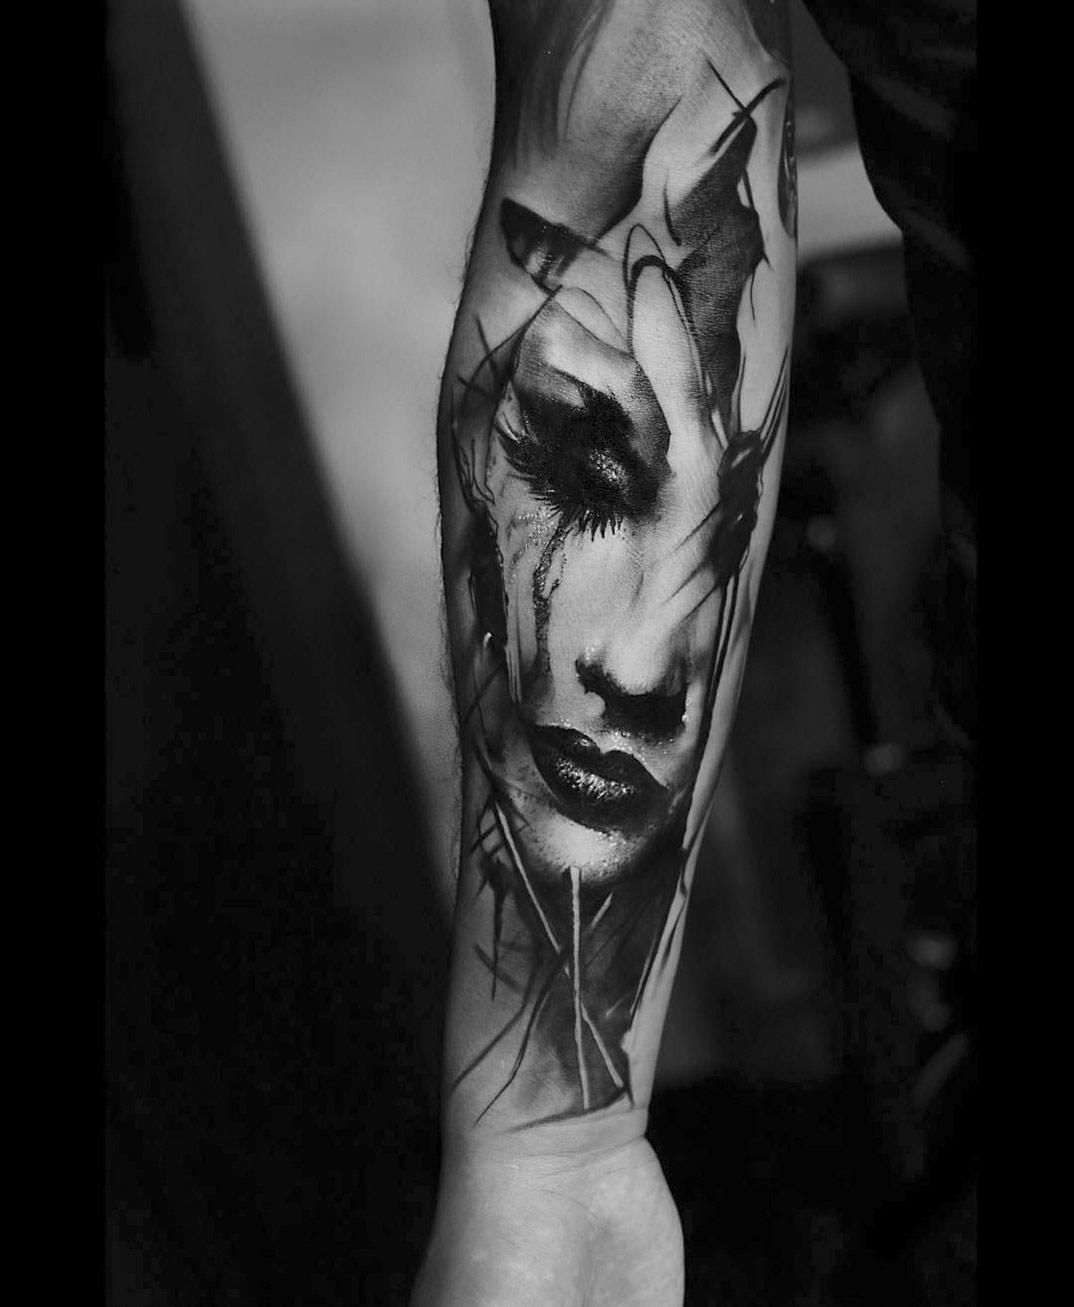 drammatici-ritratti-misteriosi-tatuaggi-monocromatici-kurt-staudinger-07